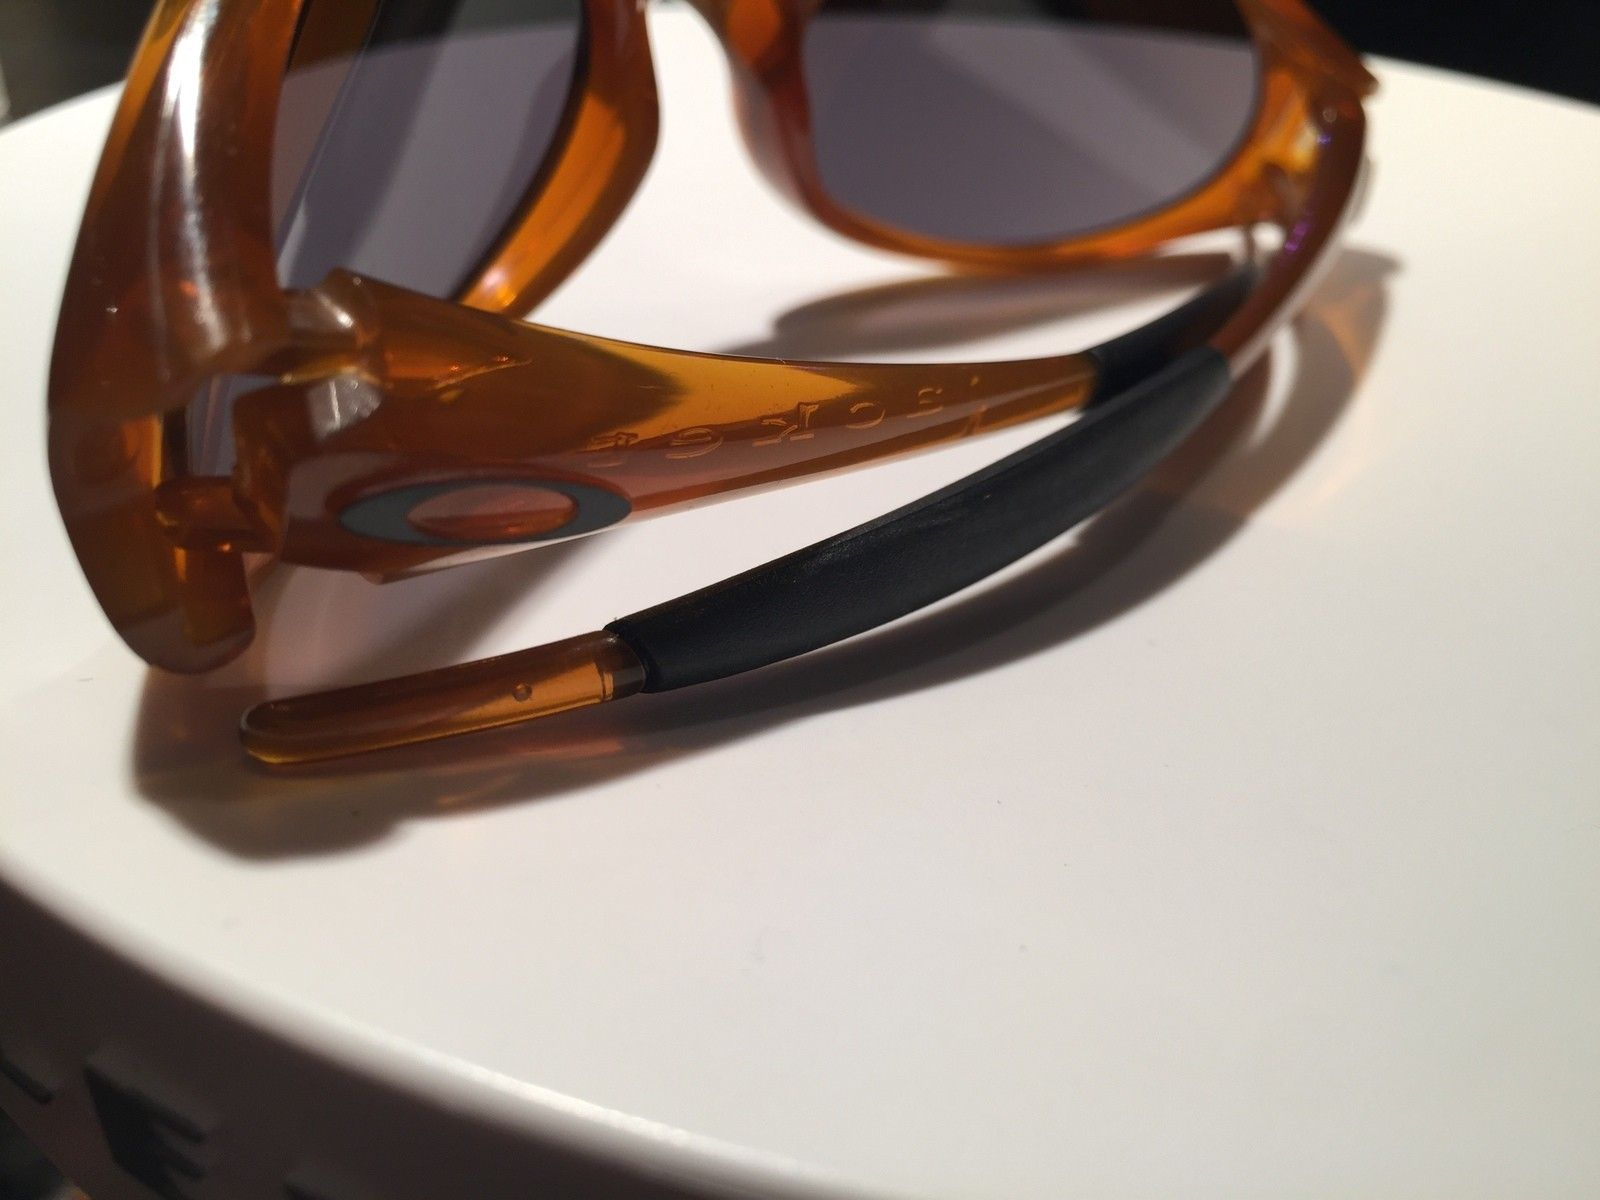 BNIB Eye Jacket 10w40 w/ Black Iridium SKU: 04-054 #SOLD - image.jpeg